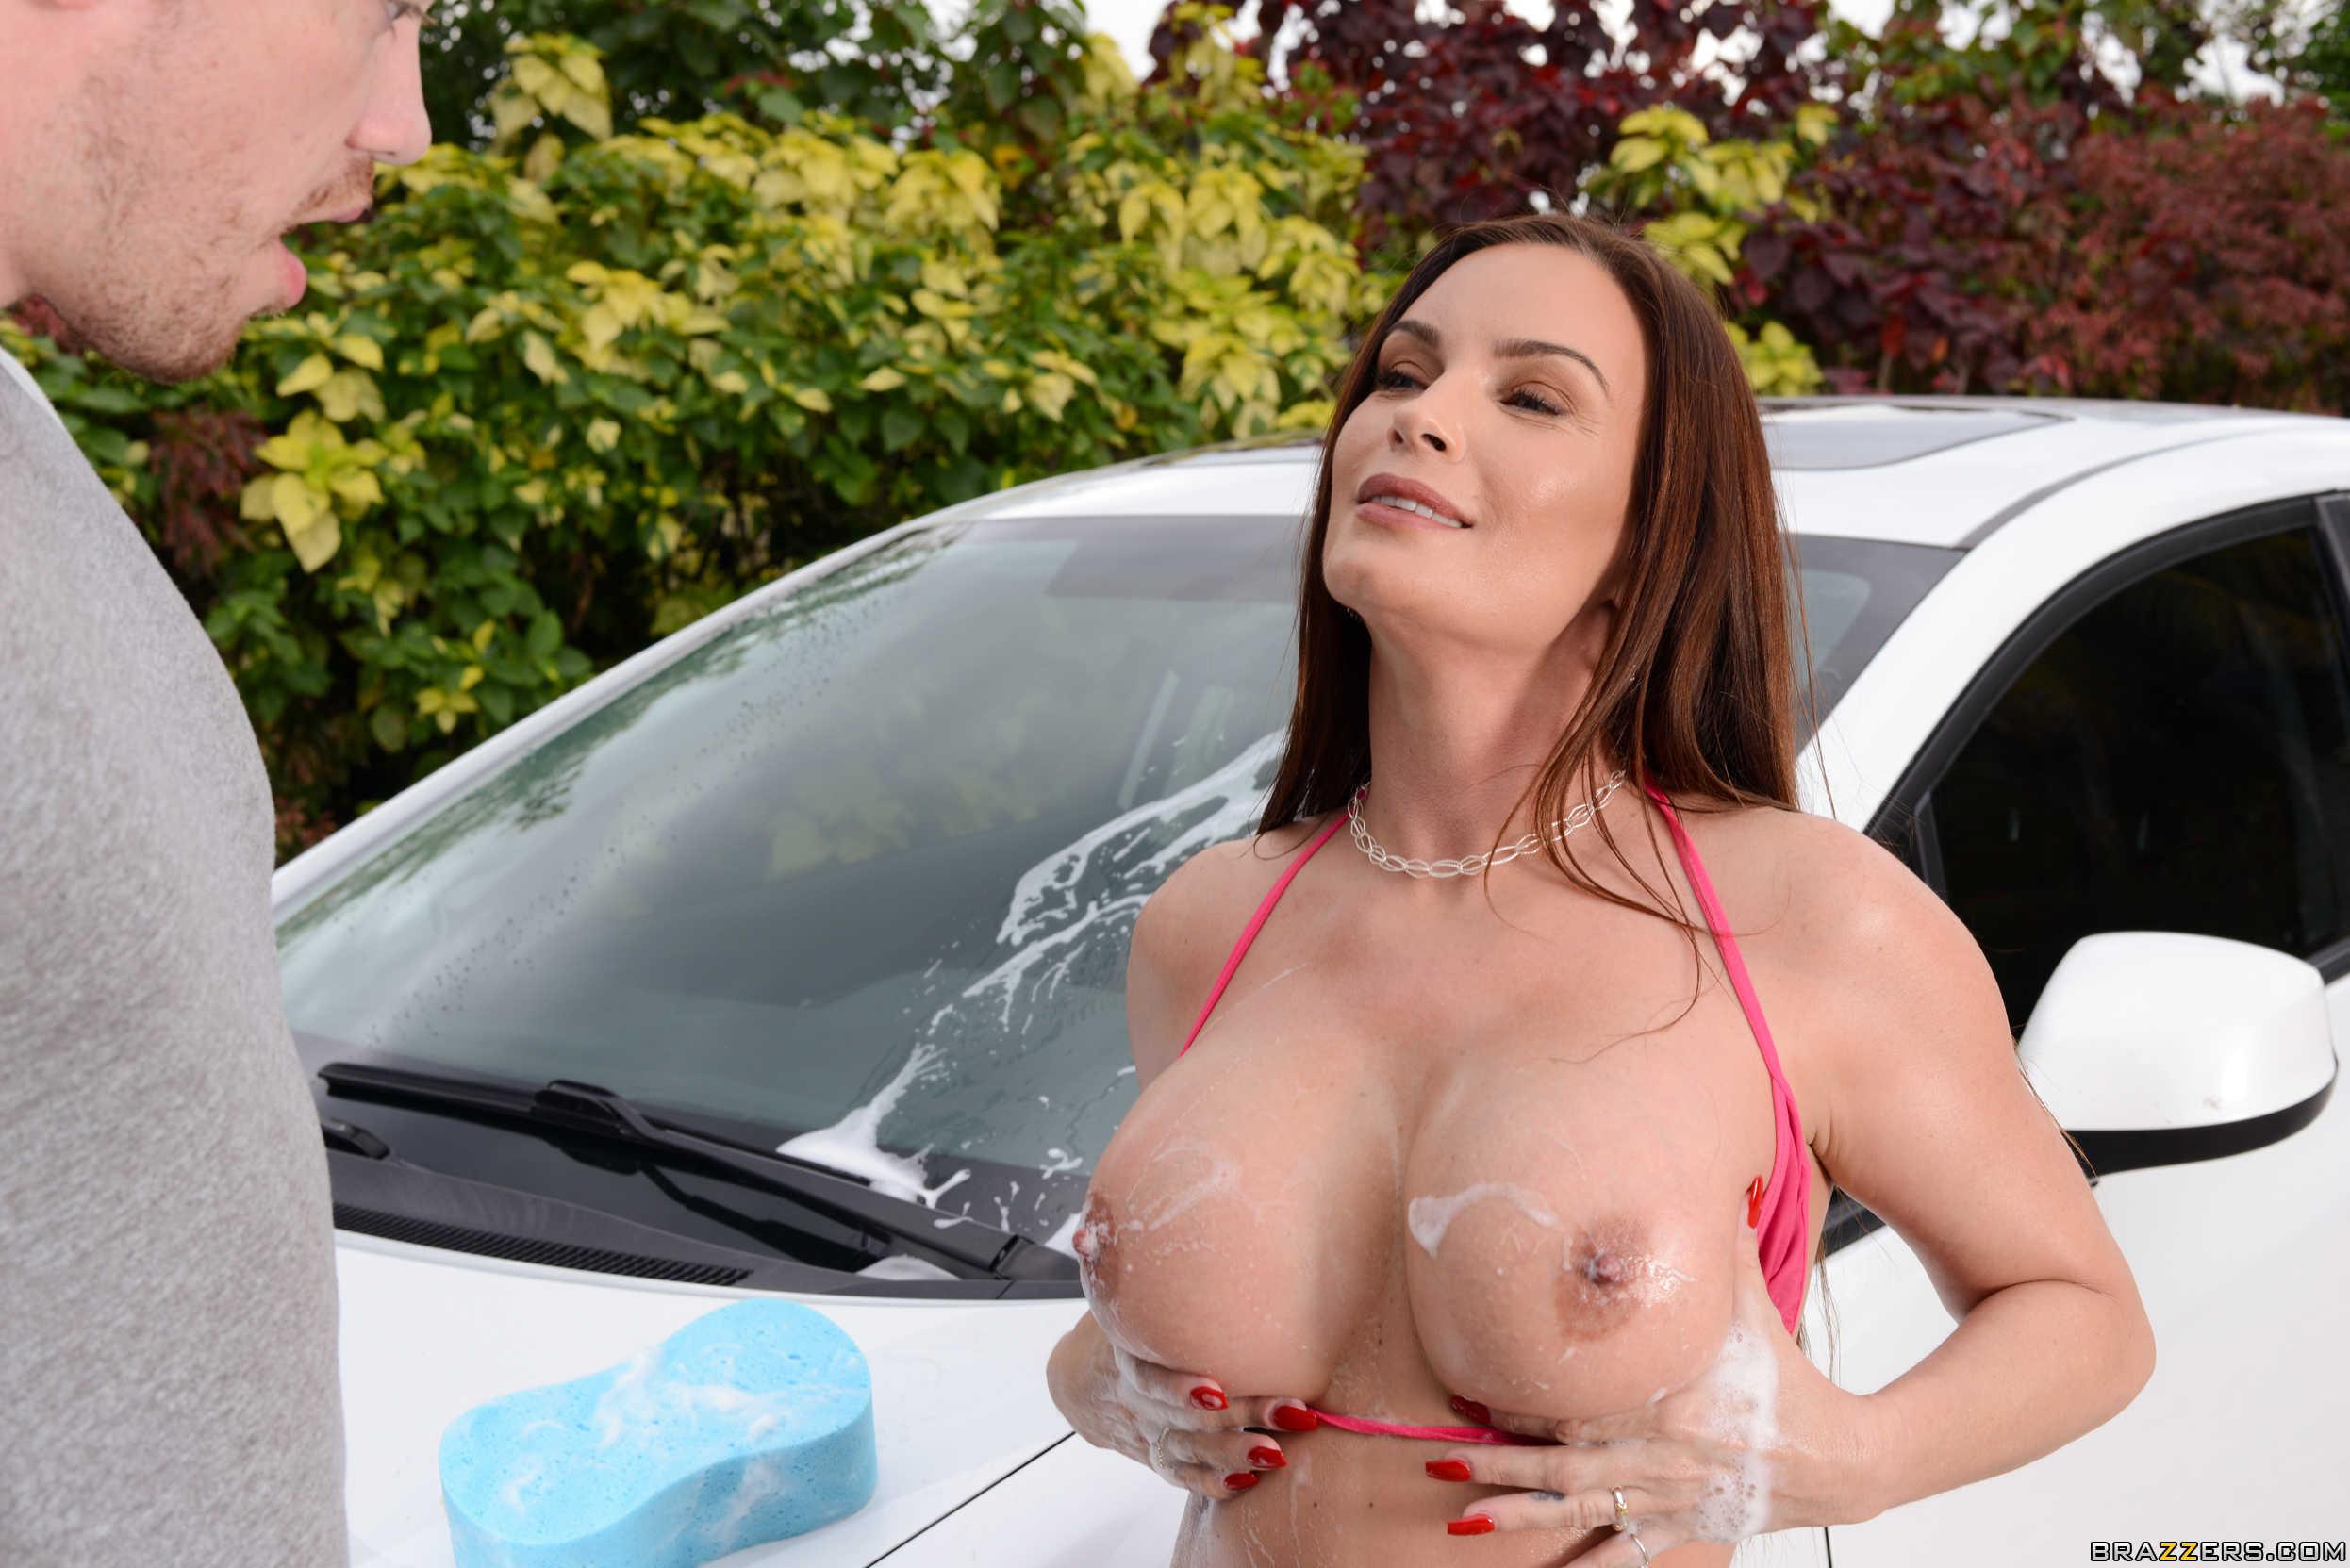 All clear, car wash girl pussy authoritative